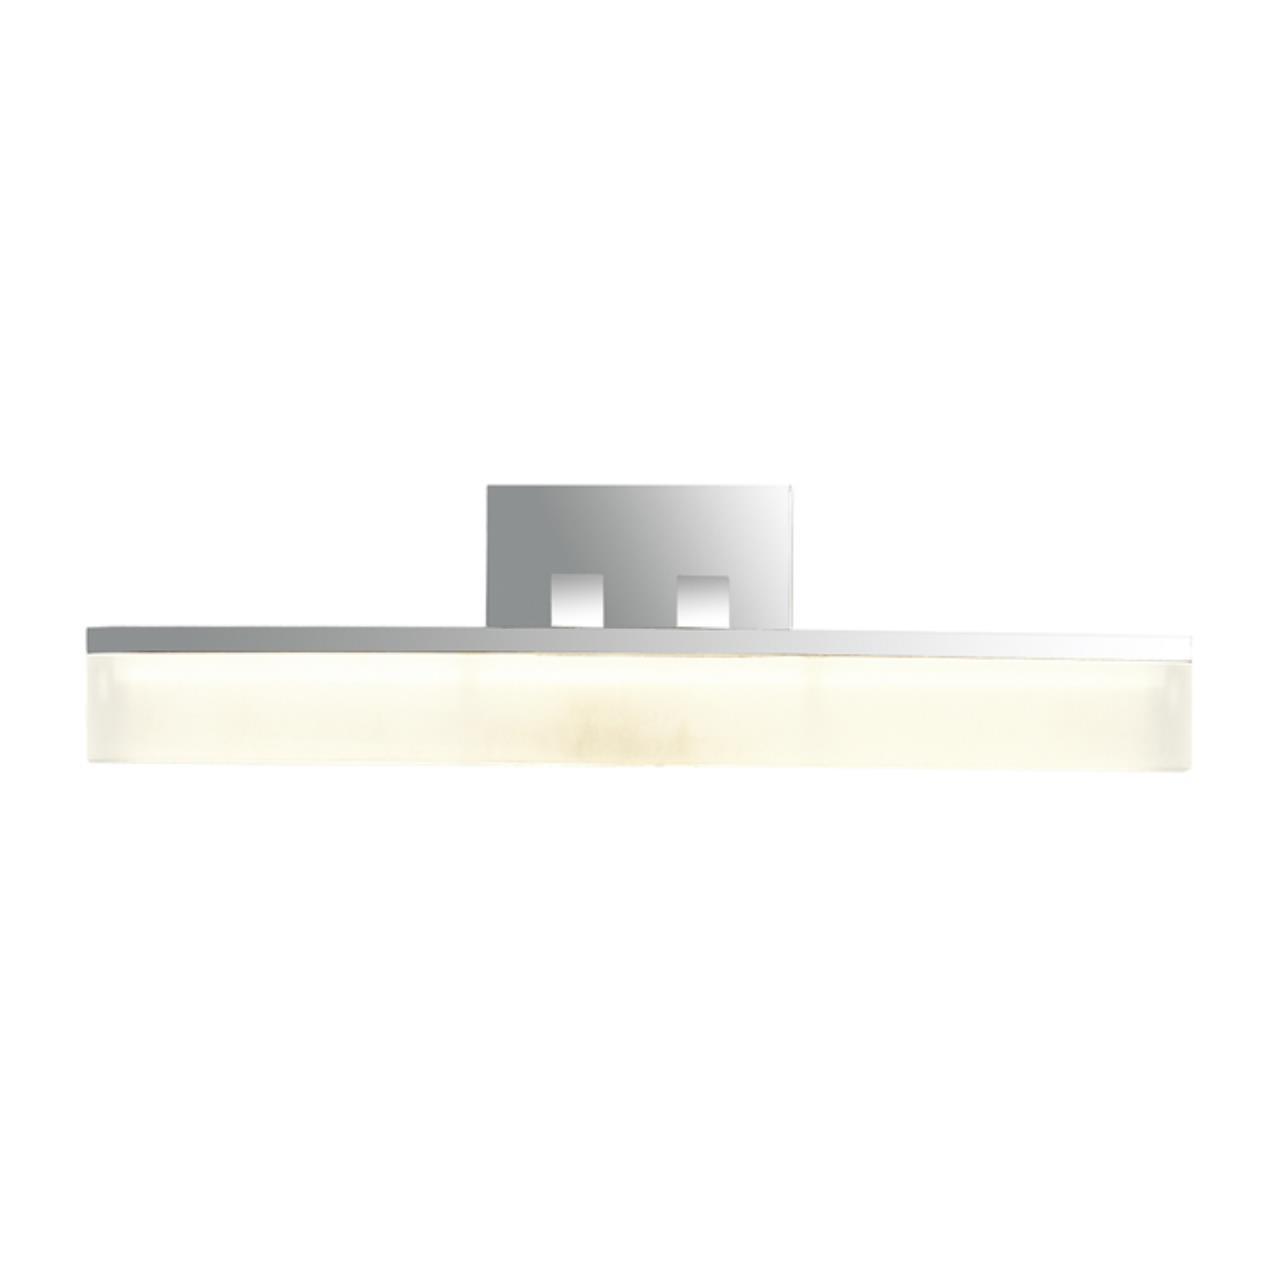 4617/12WL DROPS ODL19 651 хром/белый Настенный светильник IP44 LED 12W PORTA